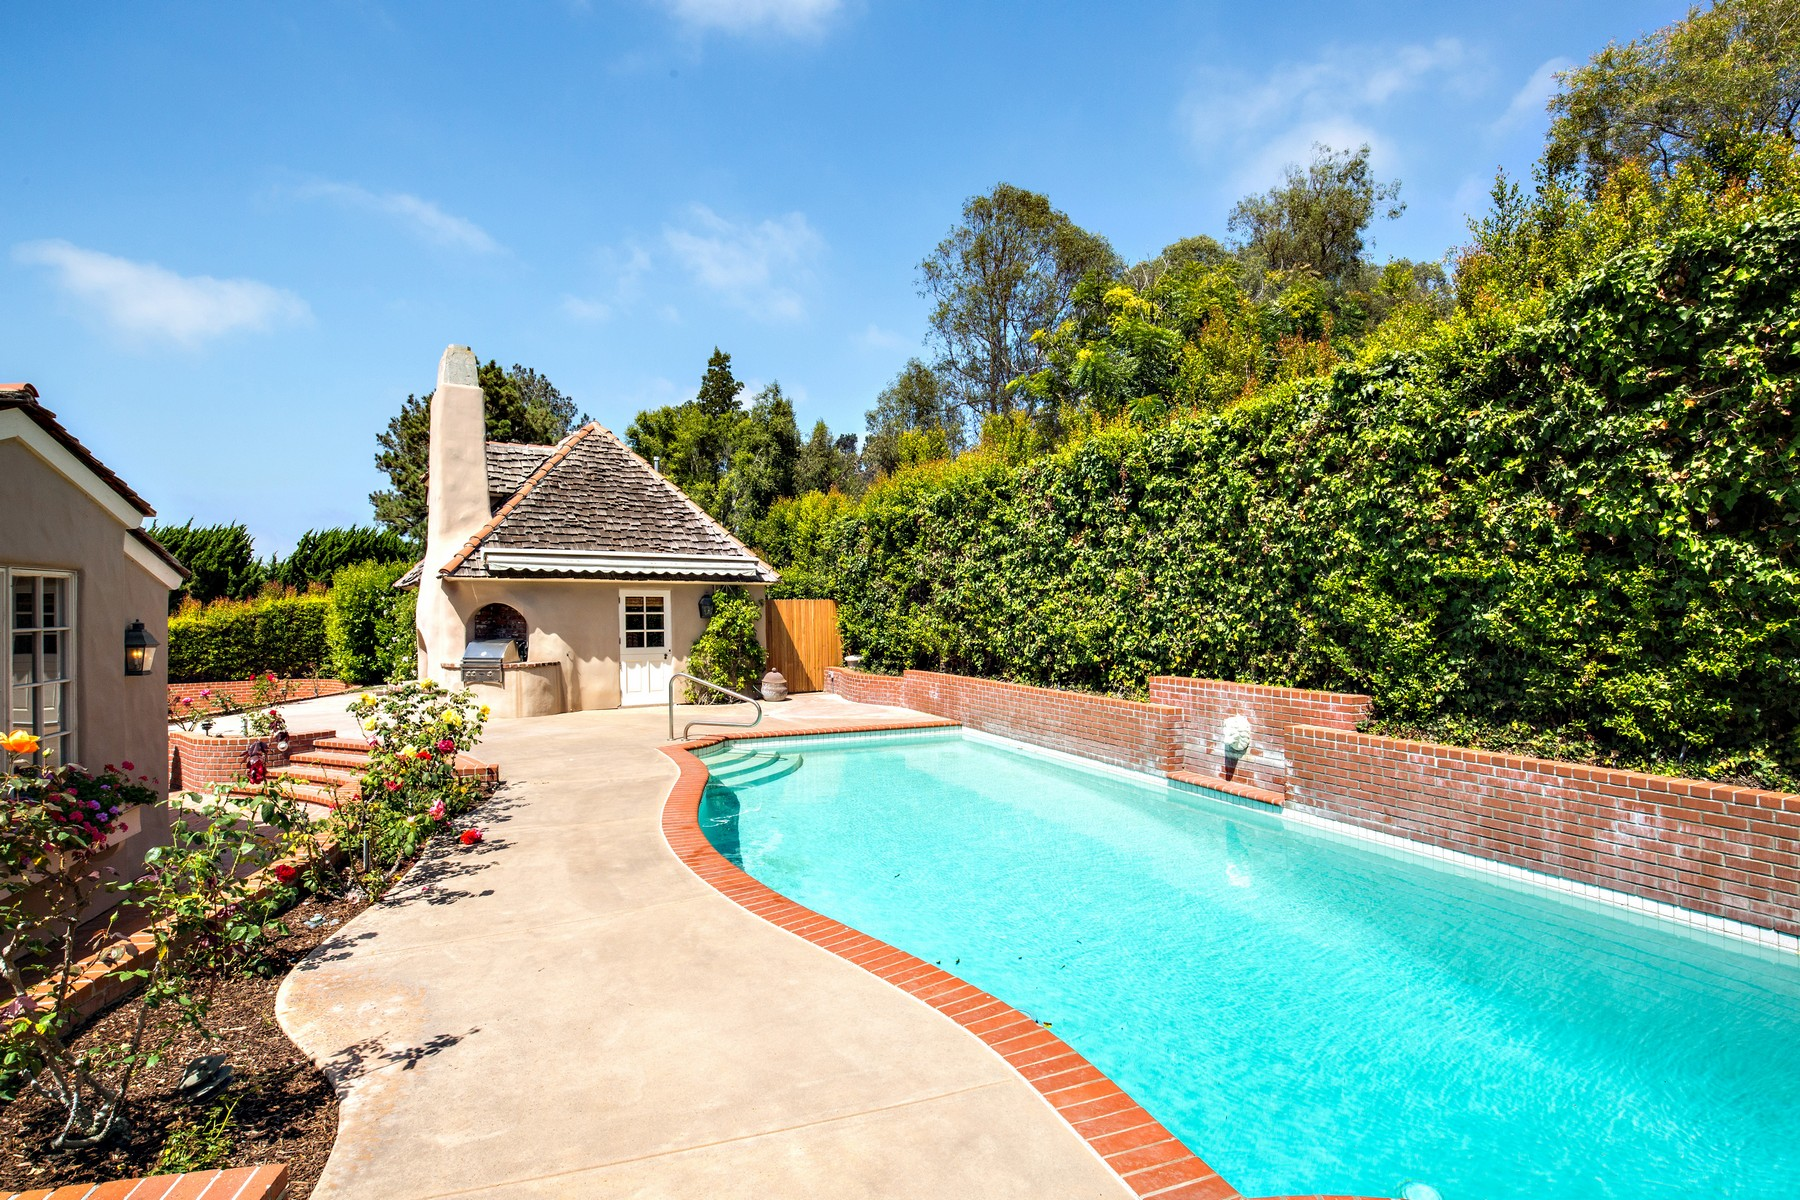 Additional photo for property listing at 6325 Muirlands Drive  La Jolla, Калифорния 92037 Соединенные Штаты